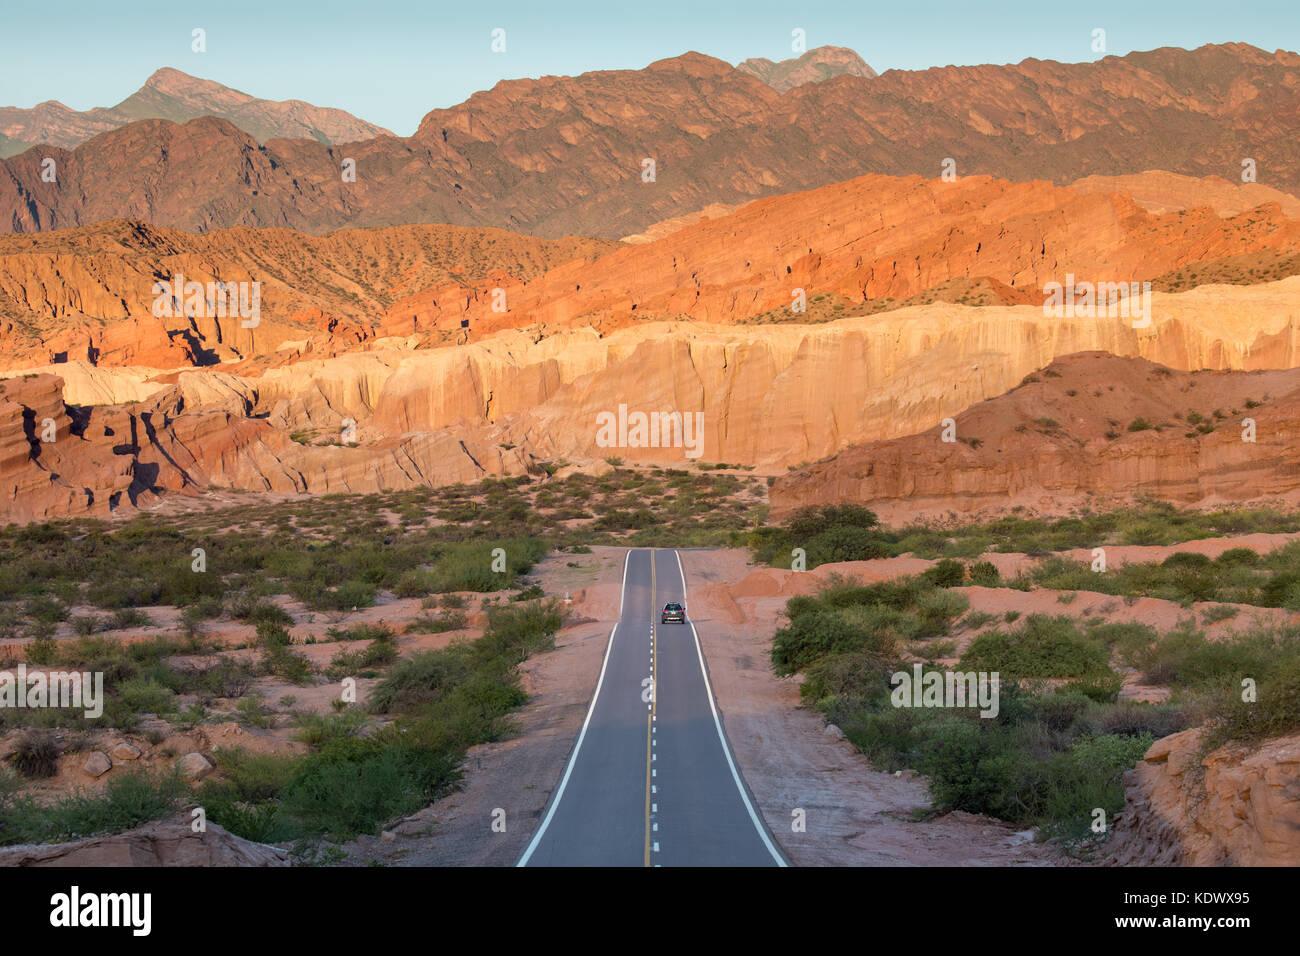 A solitary car on the road down the Quebrada de la Conches, Valles Calchaquies, Salta Province, Argentina - Stock Image